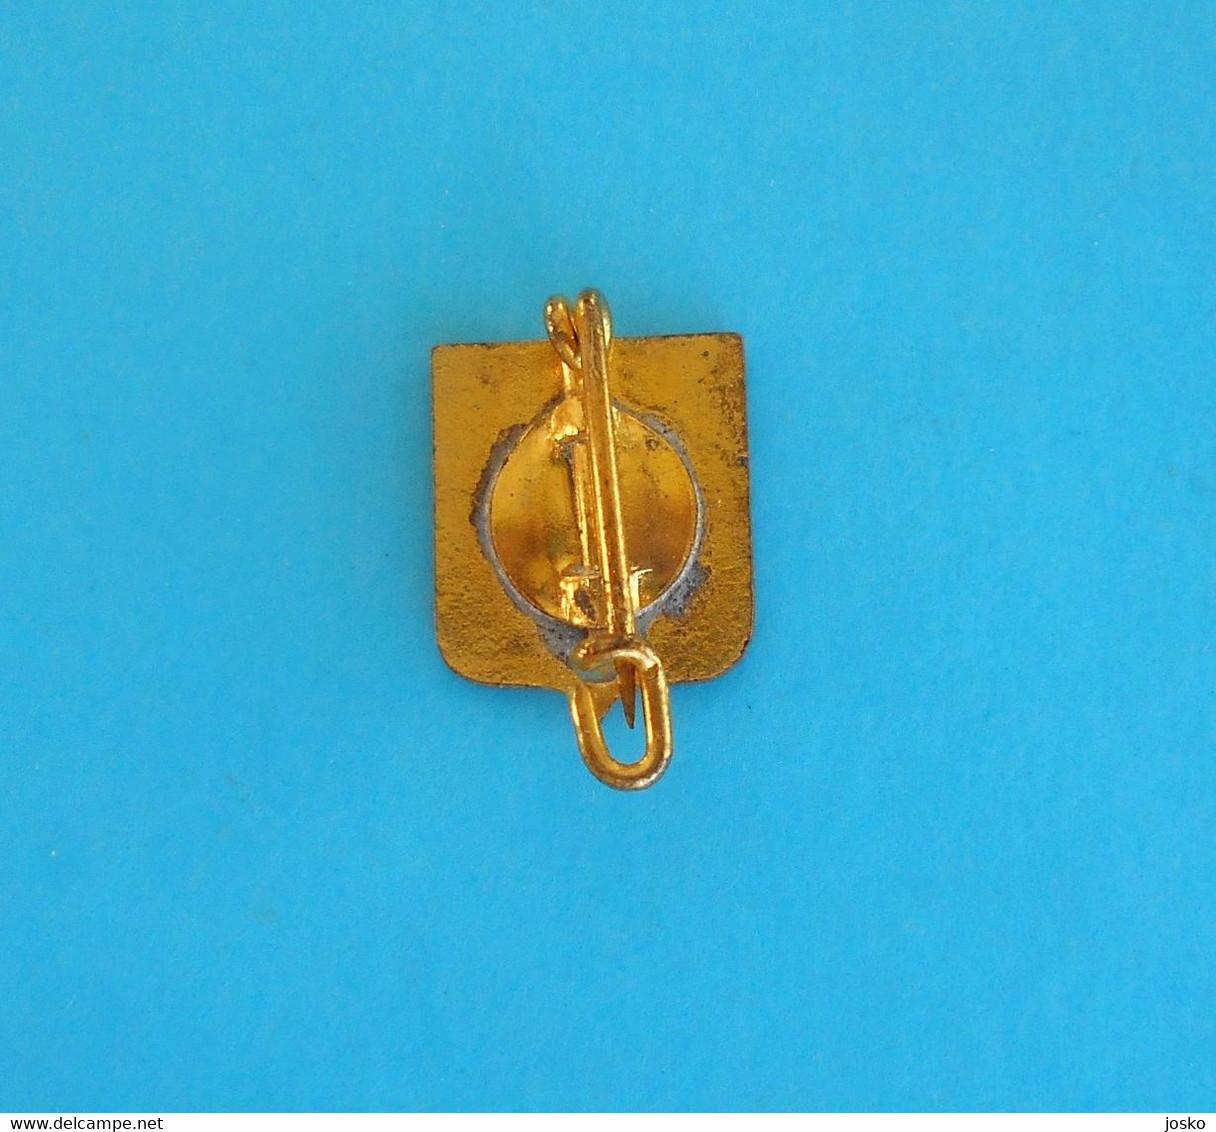 AS Saint-Étienne (A.S.S.E.) - France Football Club Old Enamel Pin Badge * Soccer Fussball Calcio Foot Futbol Futebol - Calcio